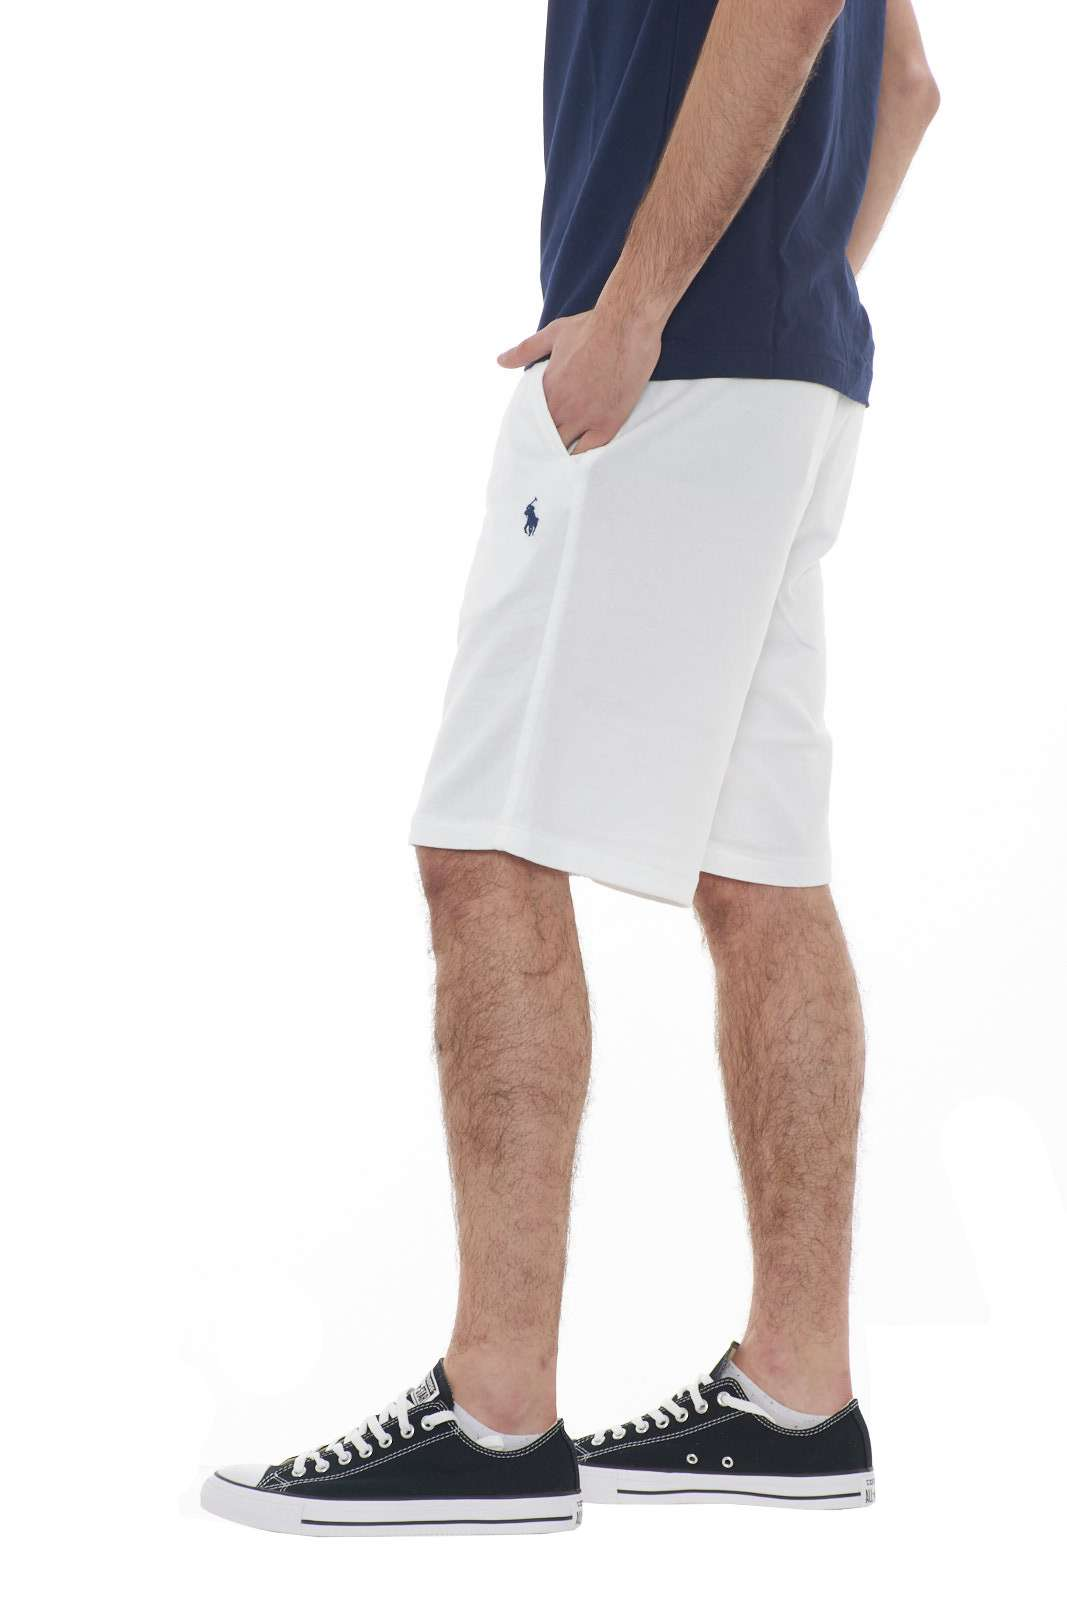 https://www.parmax.com/media/catalog/product/a/i/PE-outlet_parmax-pantaloncini-uomo-Ralph-Lauren-710704271004-B.jpg